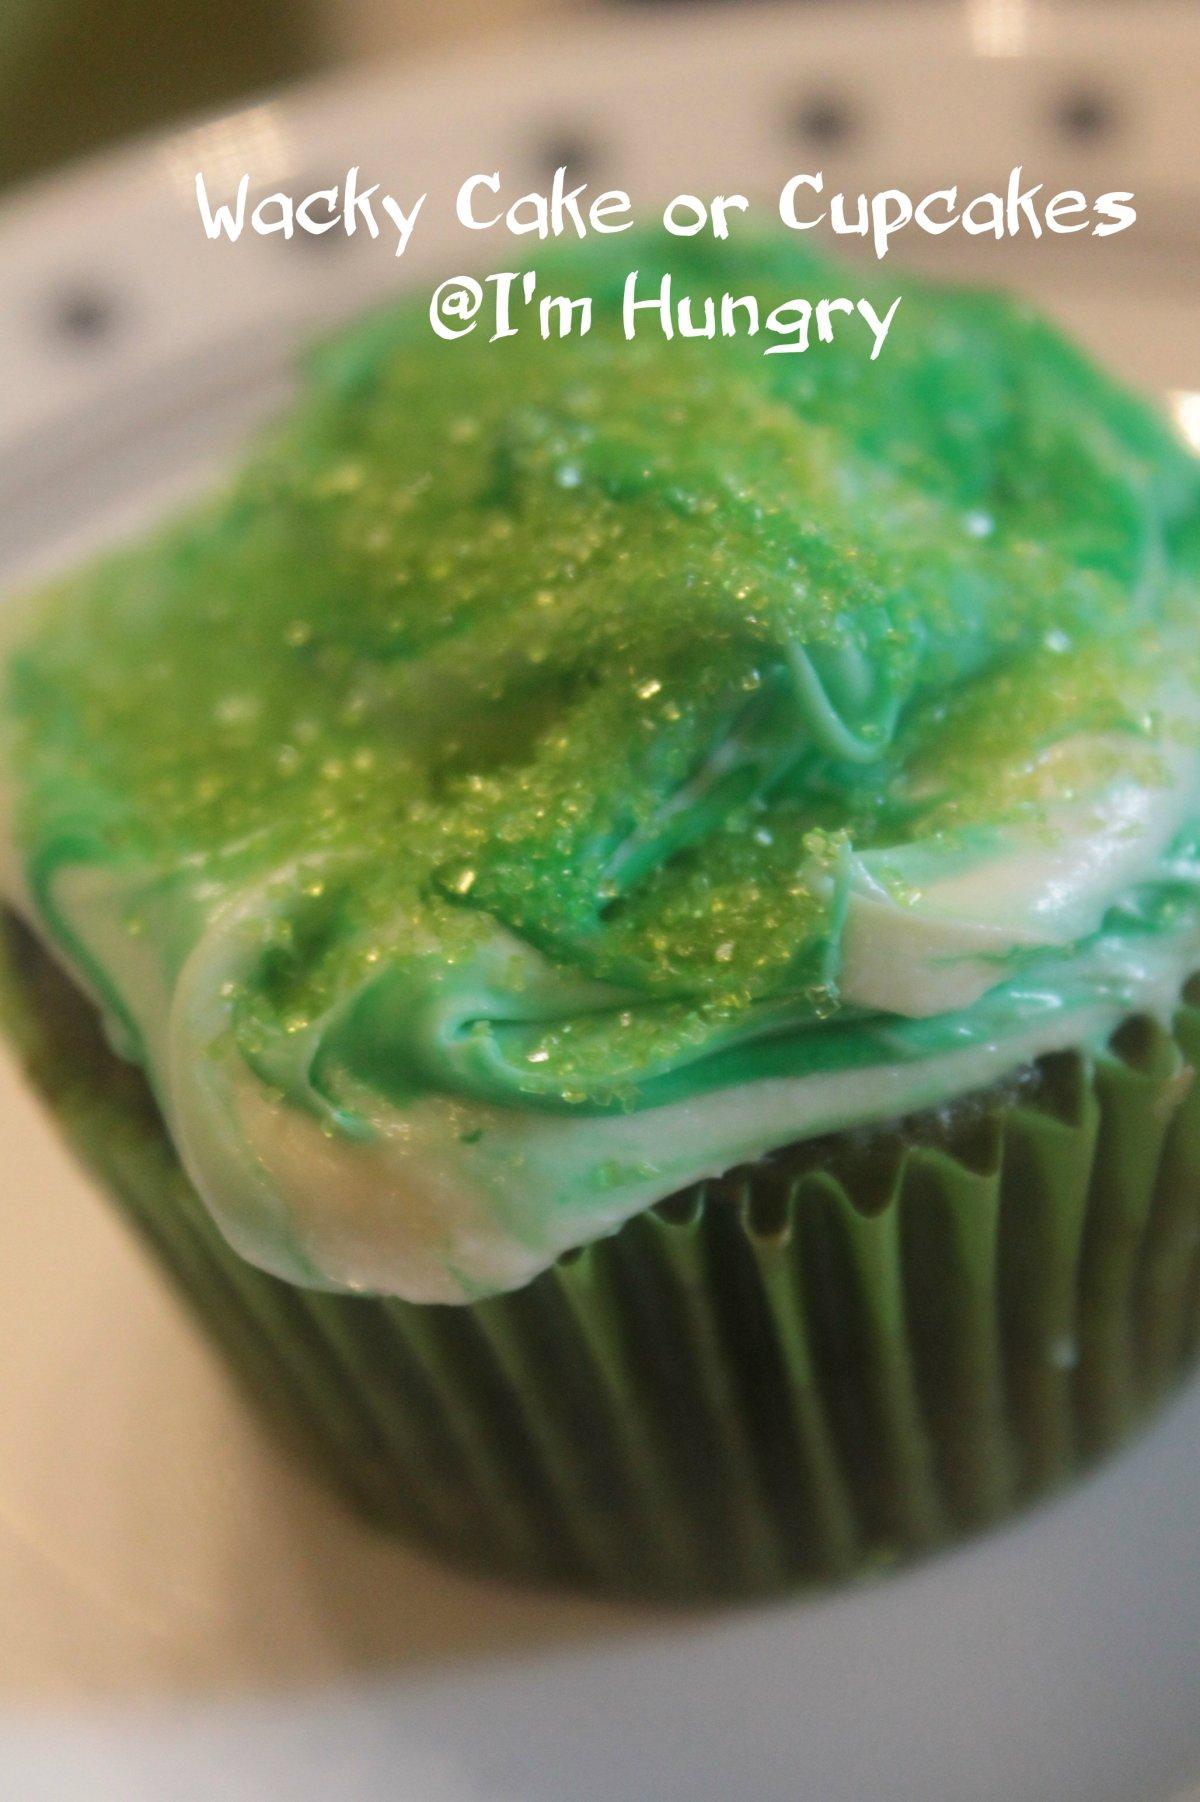 Vanilla Wacky Cakes or Cupcakes(Vegan)